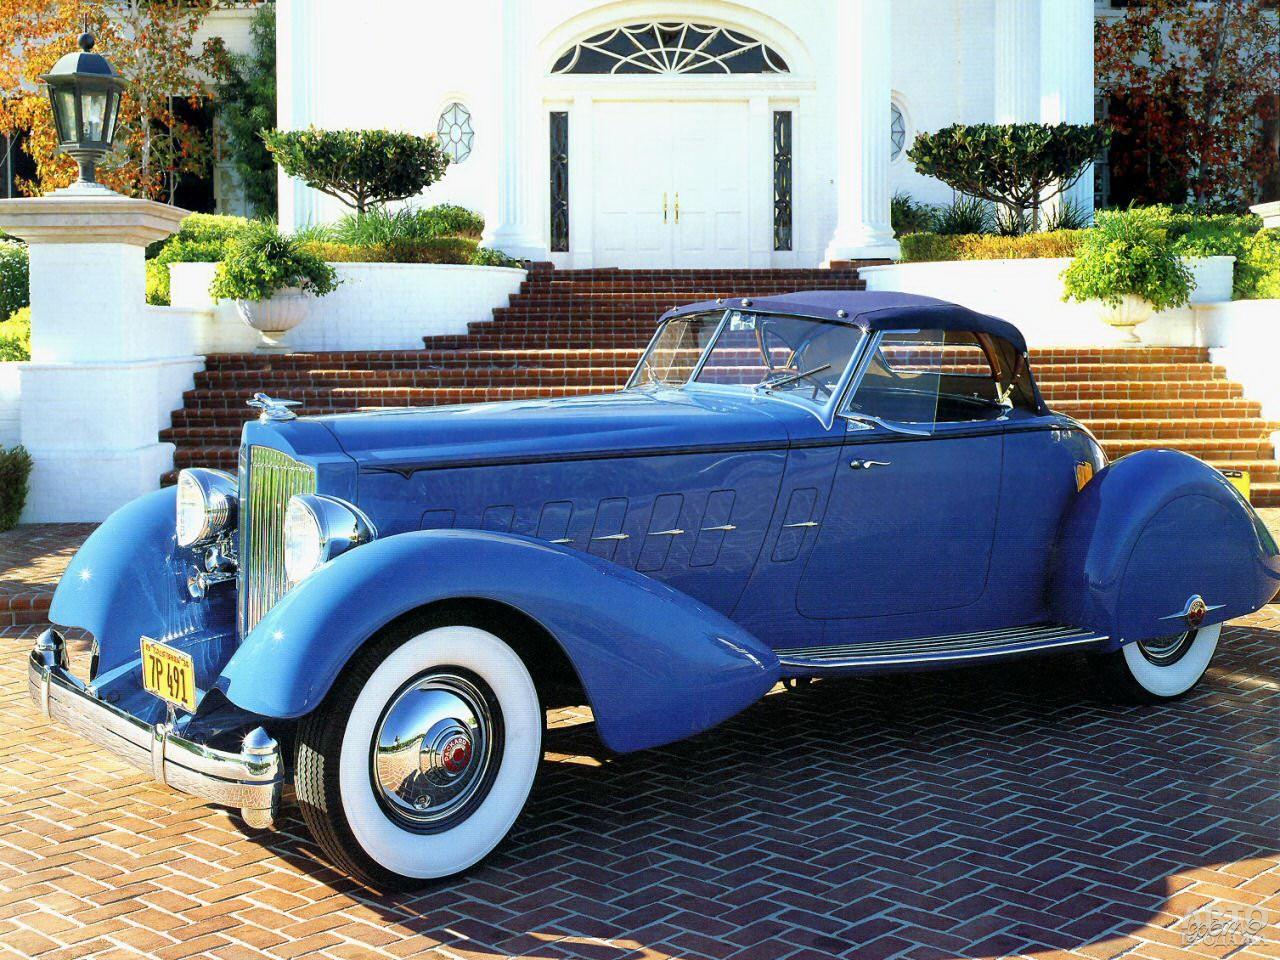 Кабриолет Packard Twelve Boattail Speedster принадлежал актеру Кларку Гейблу